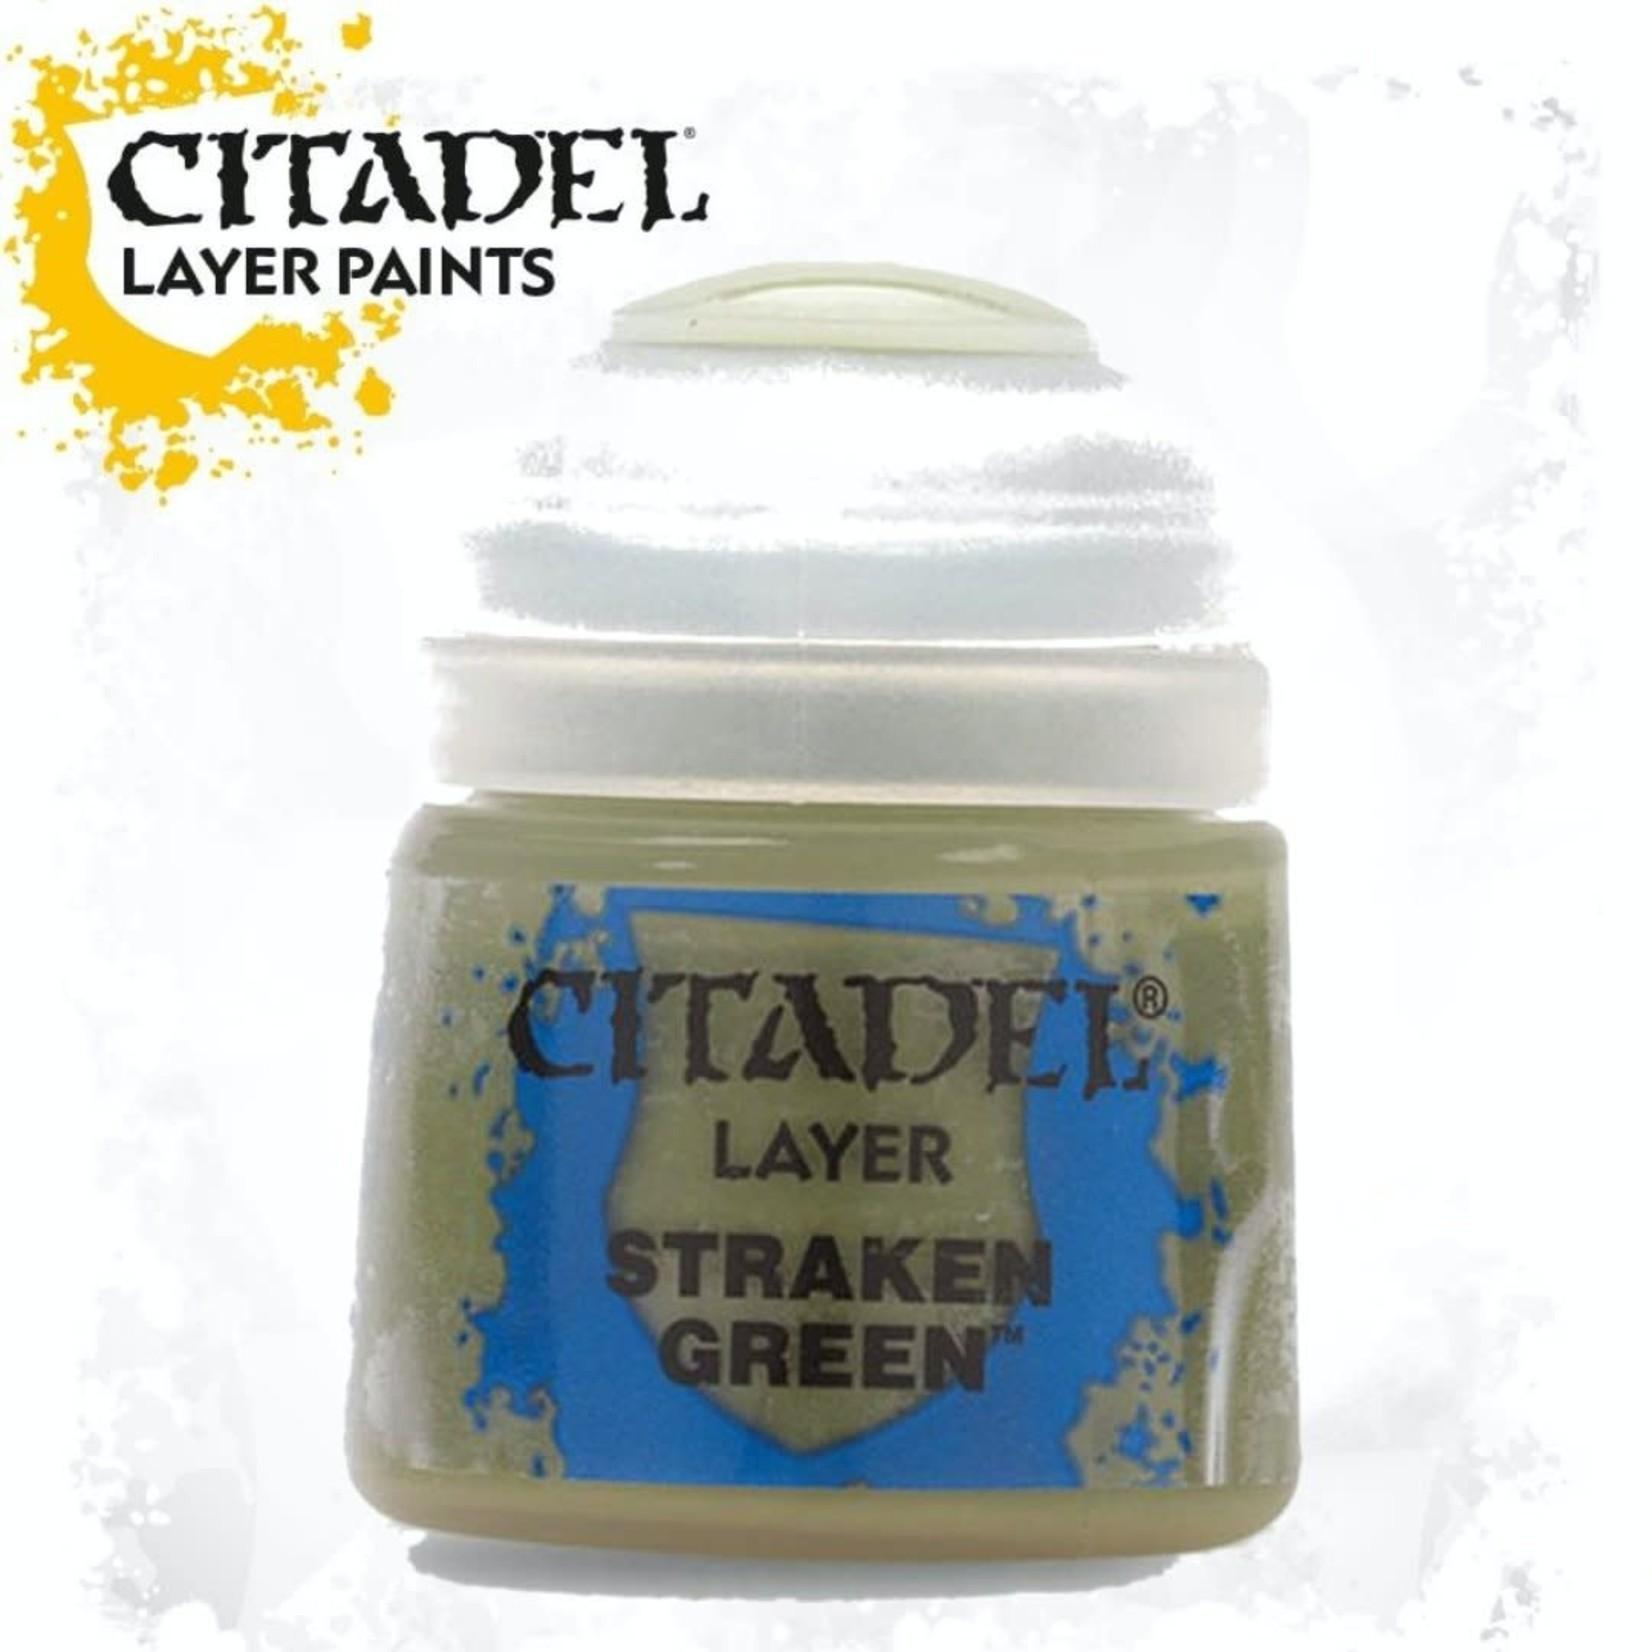 Citadel Citadel Paint - Layer: Straken Green